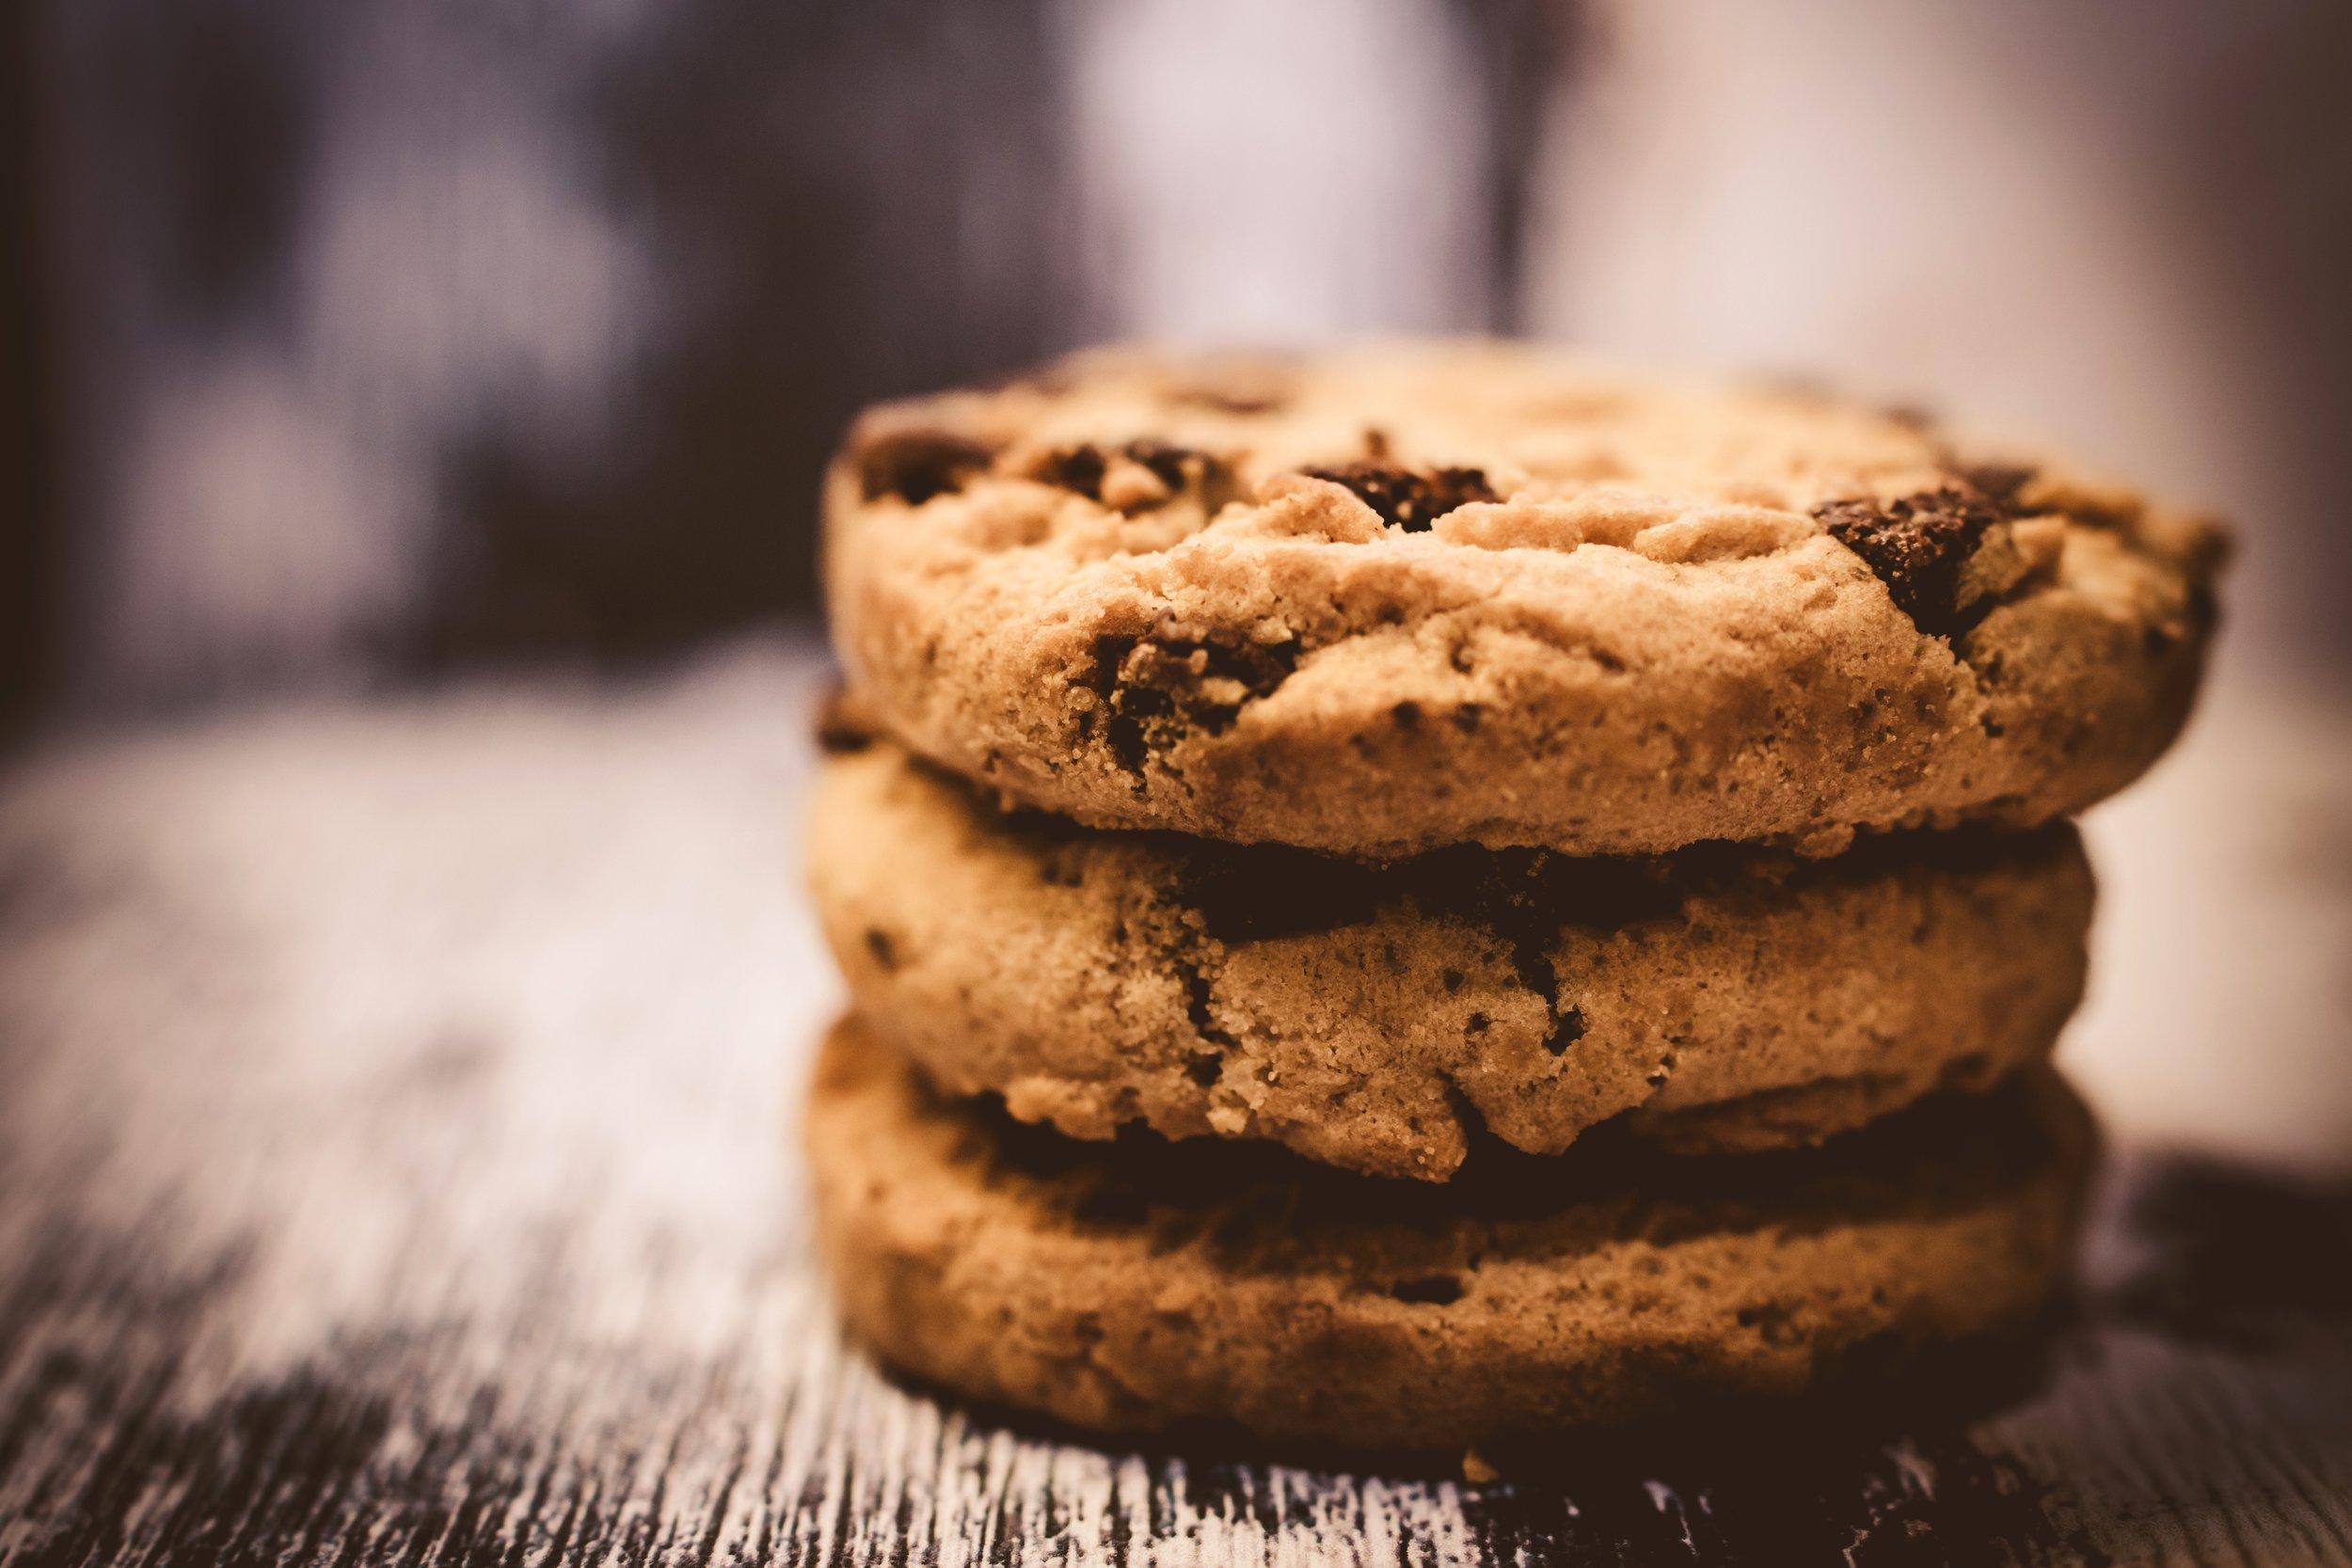 chocolate-close-up-cookies-230325.jpg